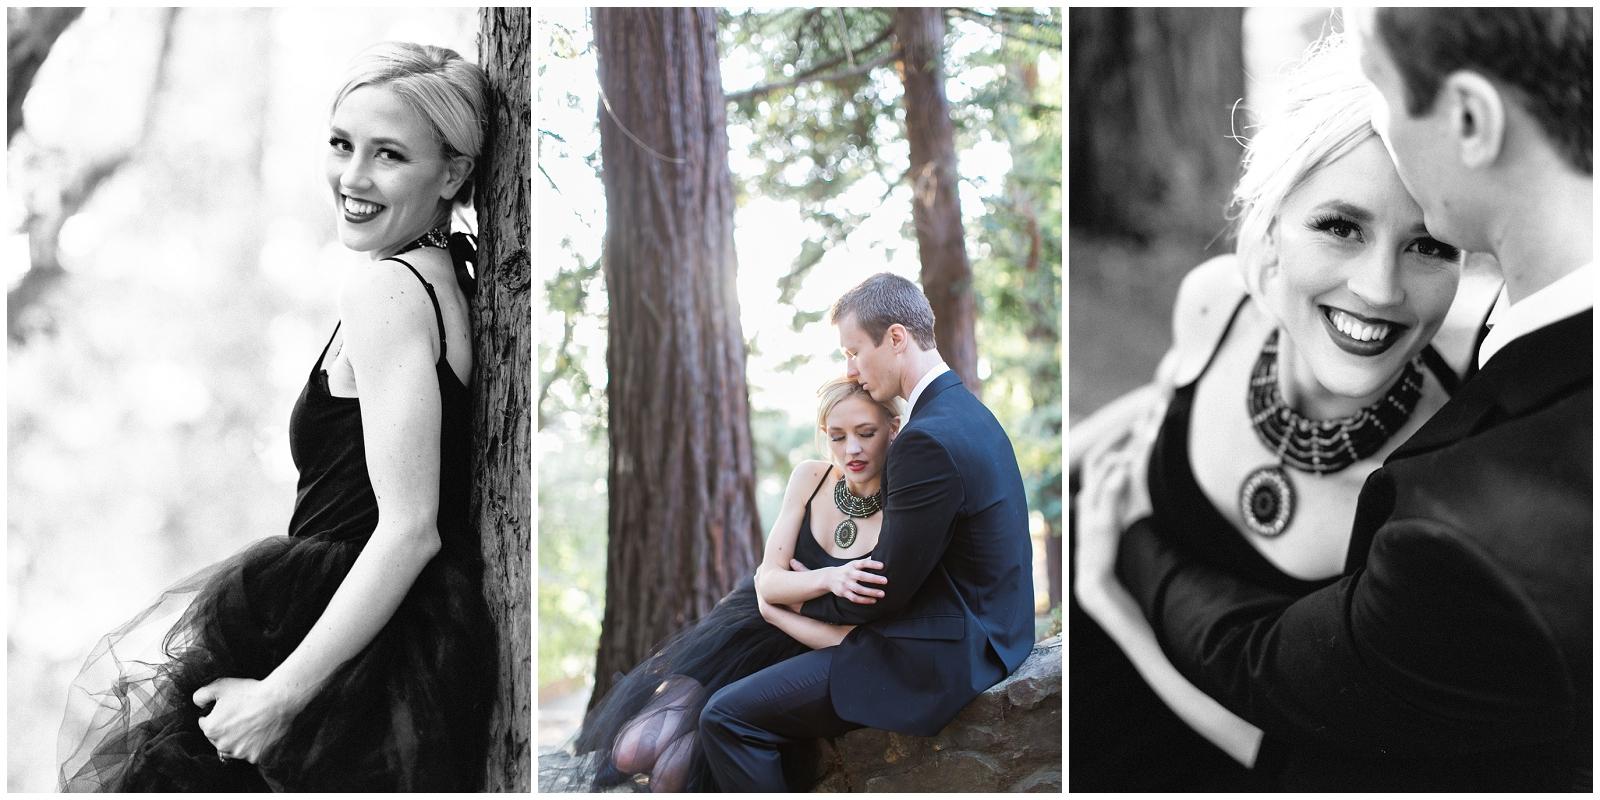 San-Francisco-Bay-Area-Wedding-Photography-Engagement-Redwoods-12.jpg